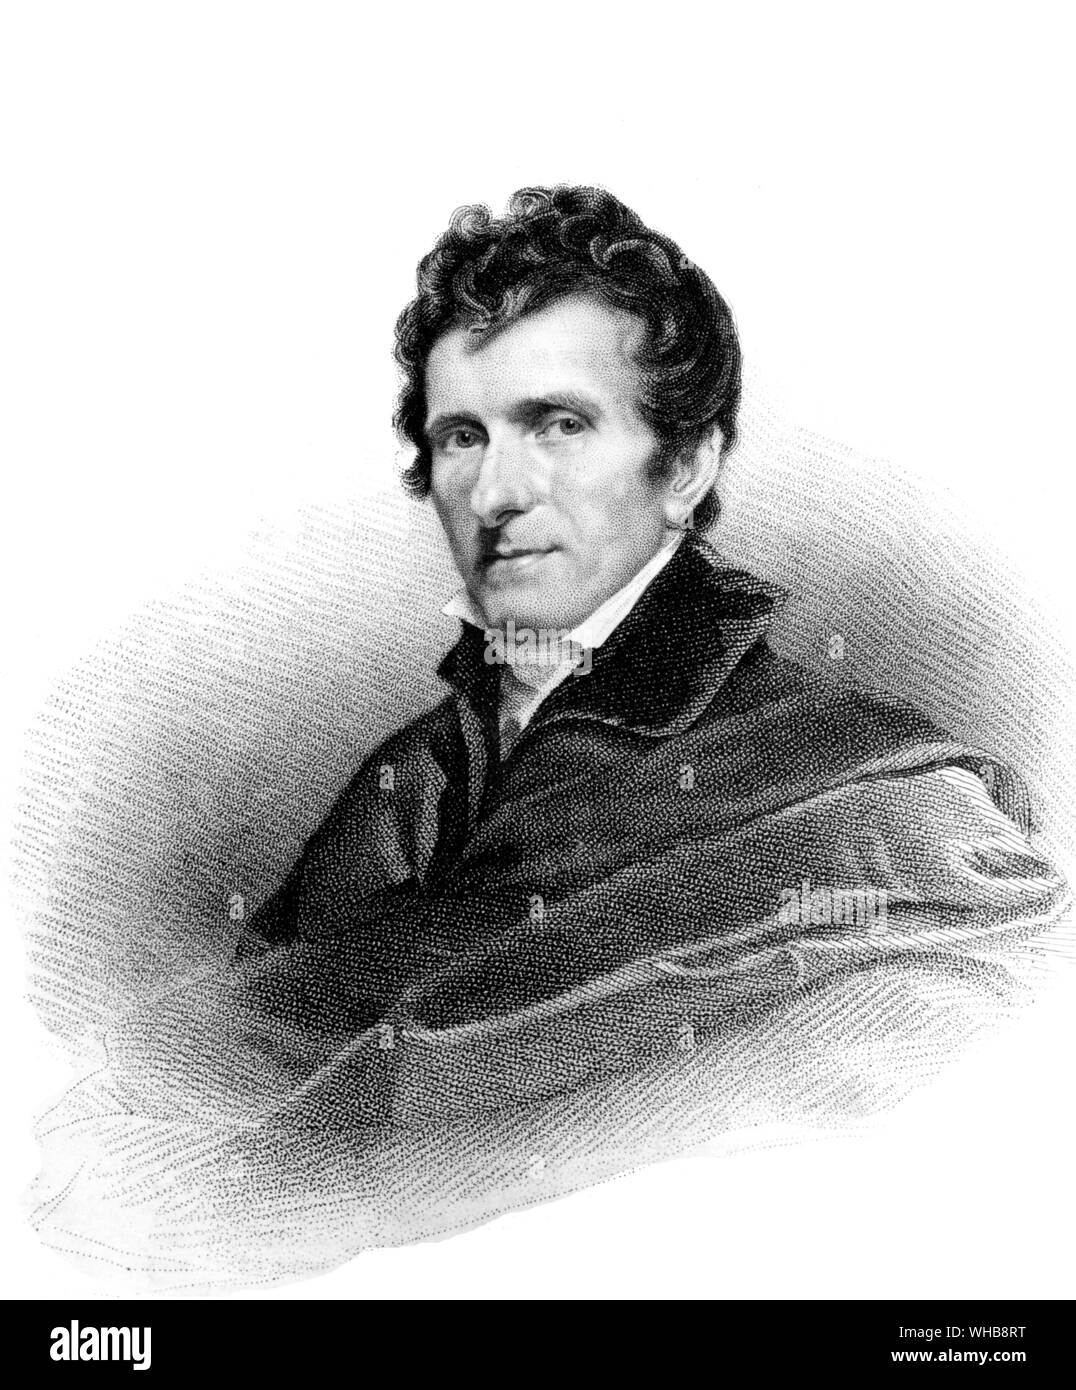 Antonio Canova, 1822, by Thomson after John Jackson - lithograph in The British Museum, London (Print Room) (J. R. Freeman) - Antonio Canova (November Stock Photo